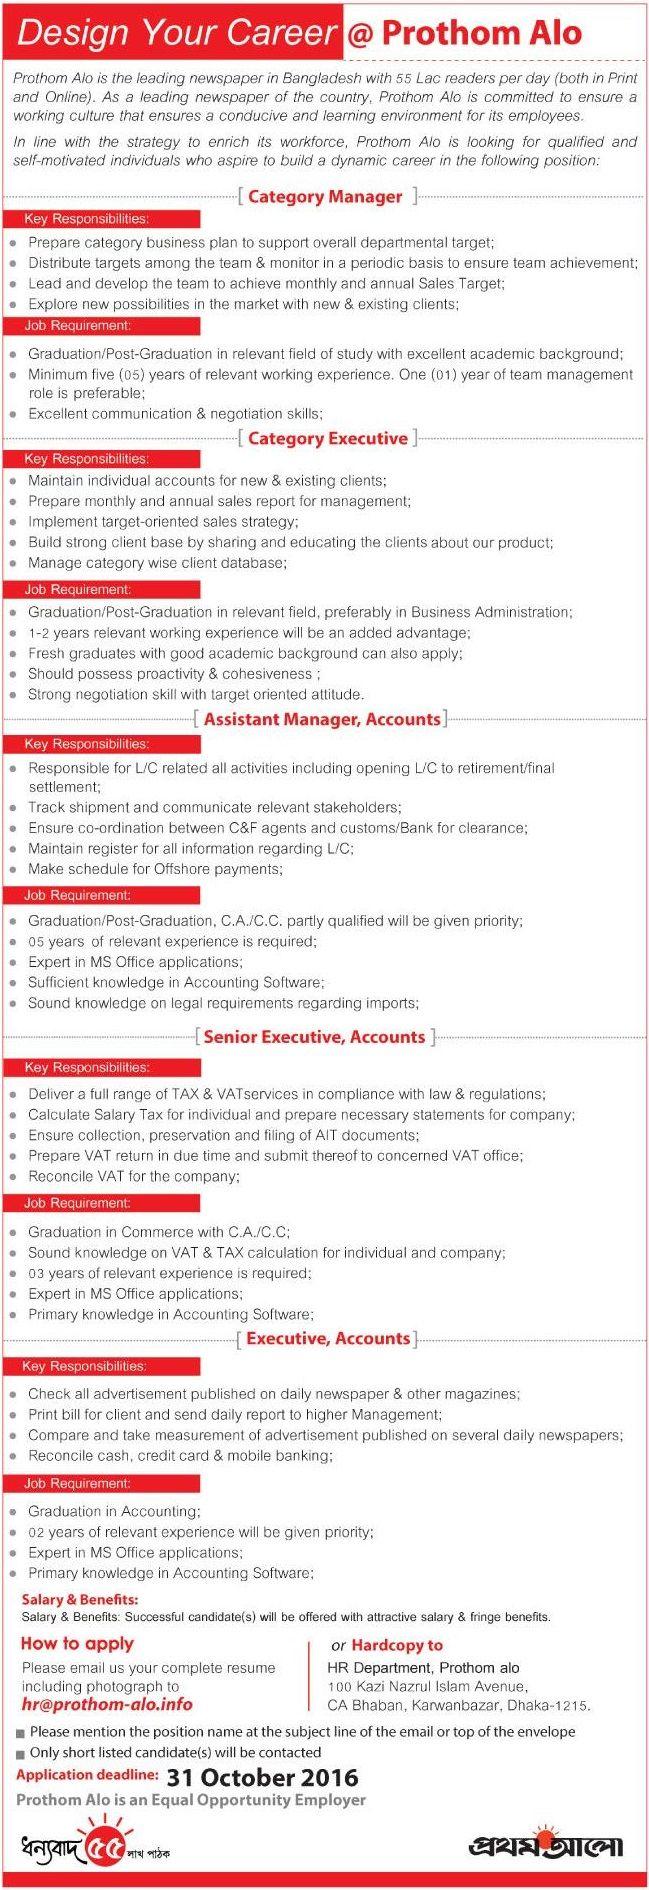 best ideas about job circular textile jobs daily prothom alo job circular